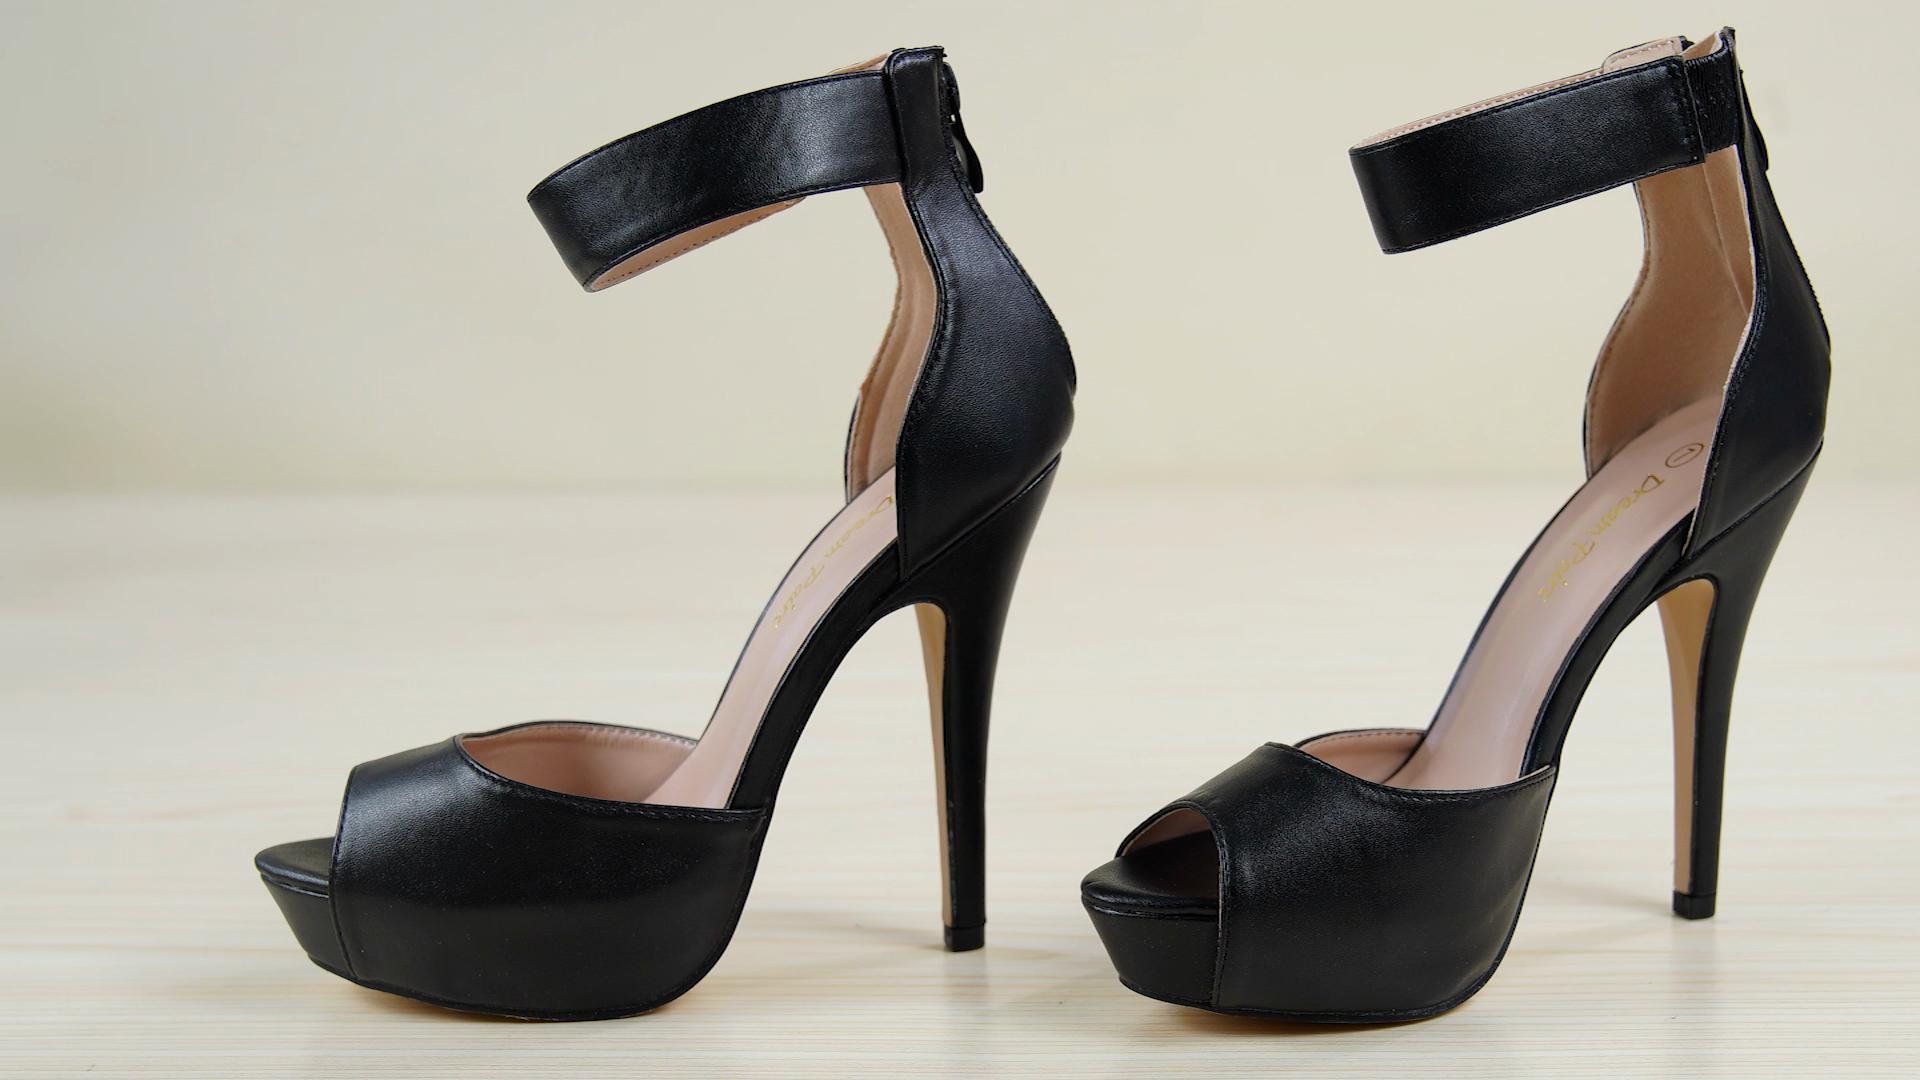 1cdeda49cfd2 DREAM PAIRS Women s Swan High Heel Platform Dress Pump Shoes